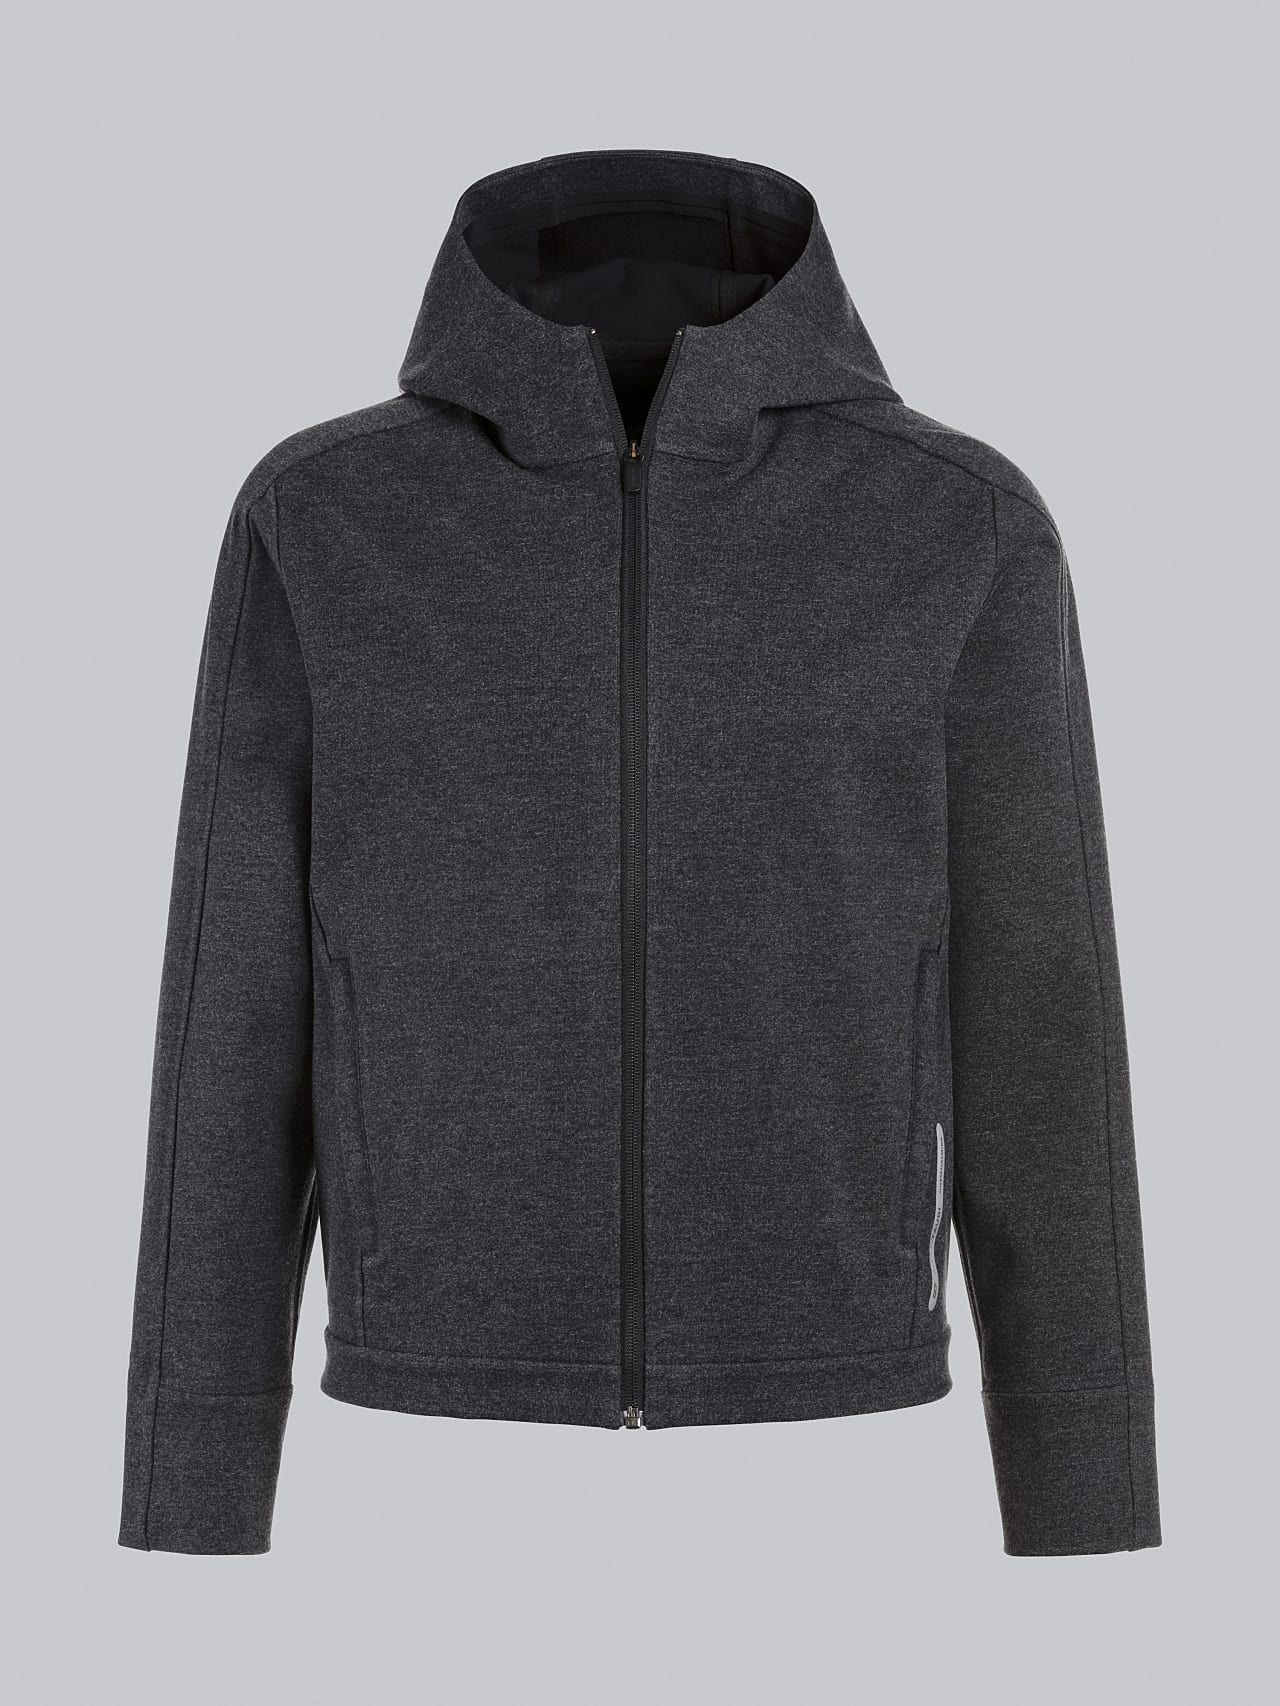 SINNO V2.Y5.02 Waterproof Hooded Jacket dark grey / anthracite Back Alpha Tauri